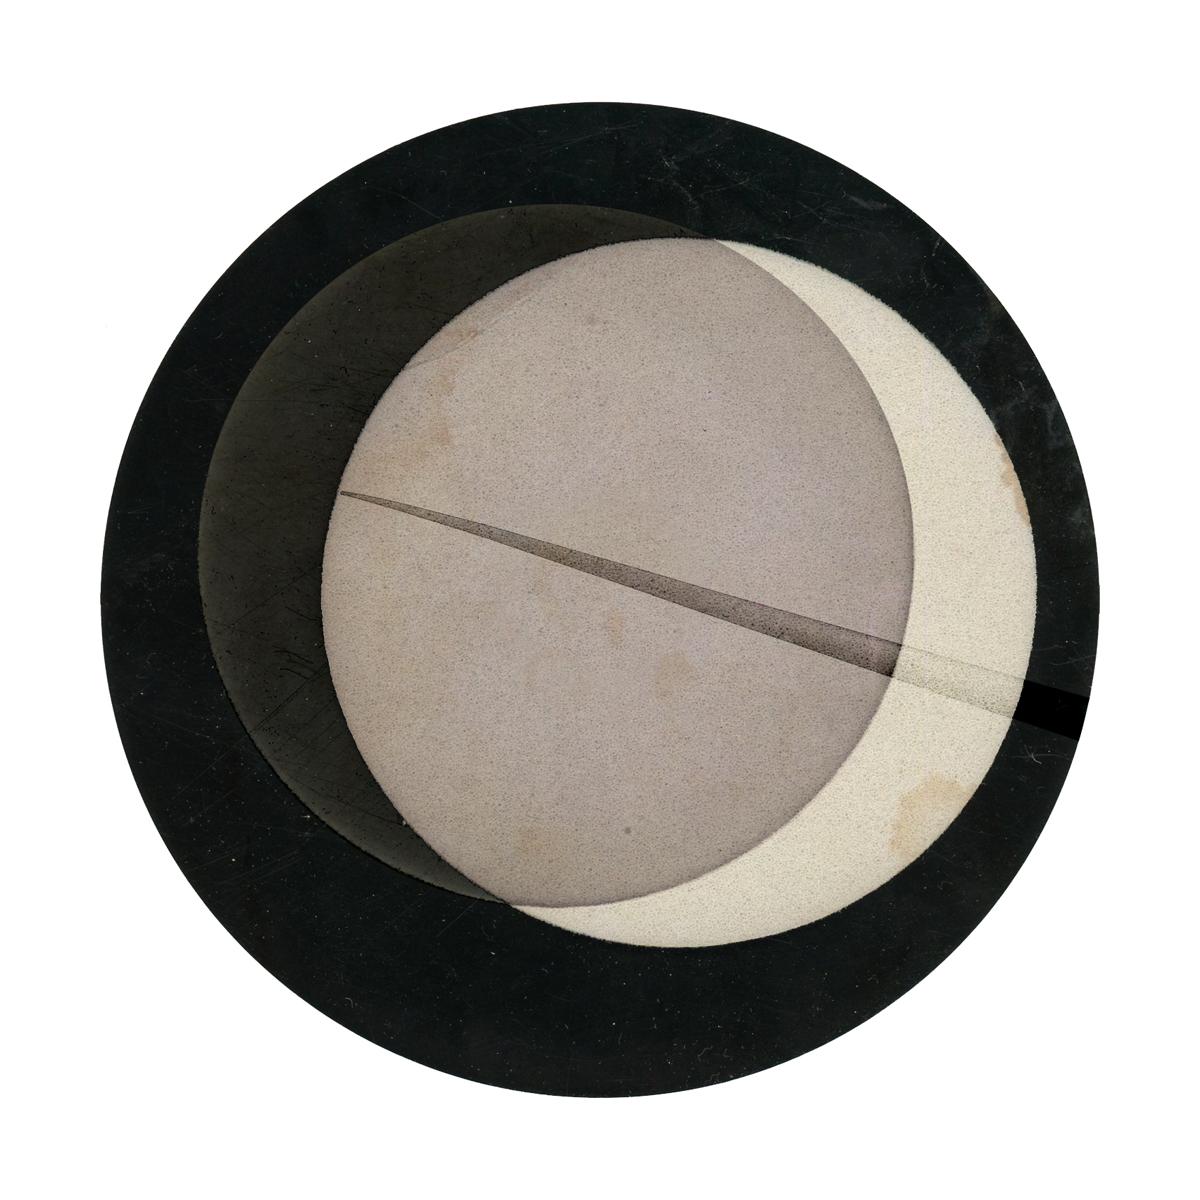 Circle with Pierce, 2017 (2).jpg